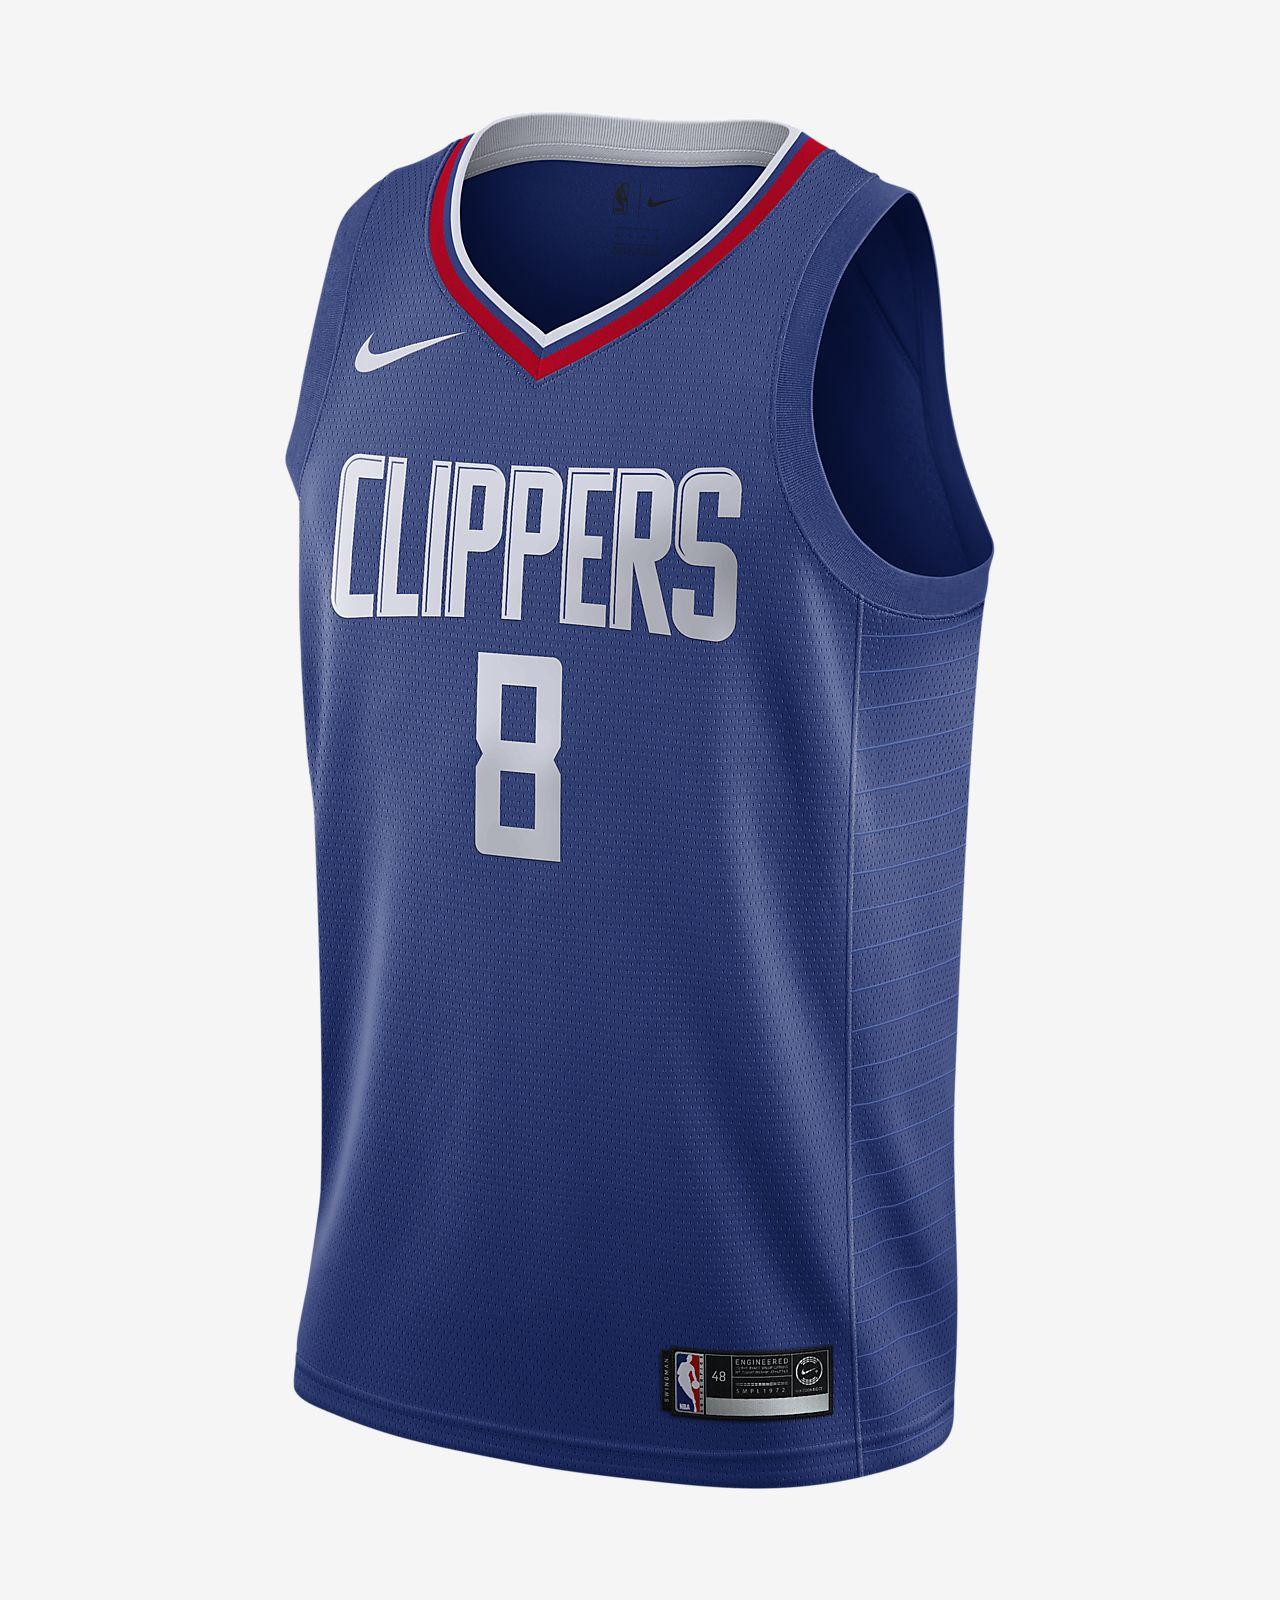 Męska koszulka Nike NBA Connected Jersey Danilo Gallinari Icon Edition Swingman Jersey (LA Clippers)